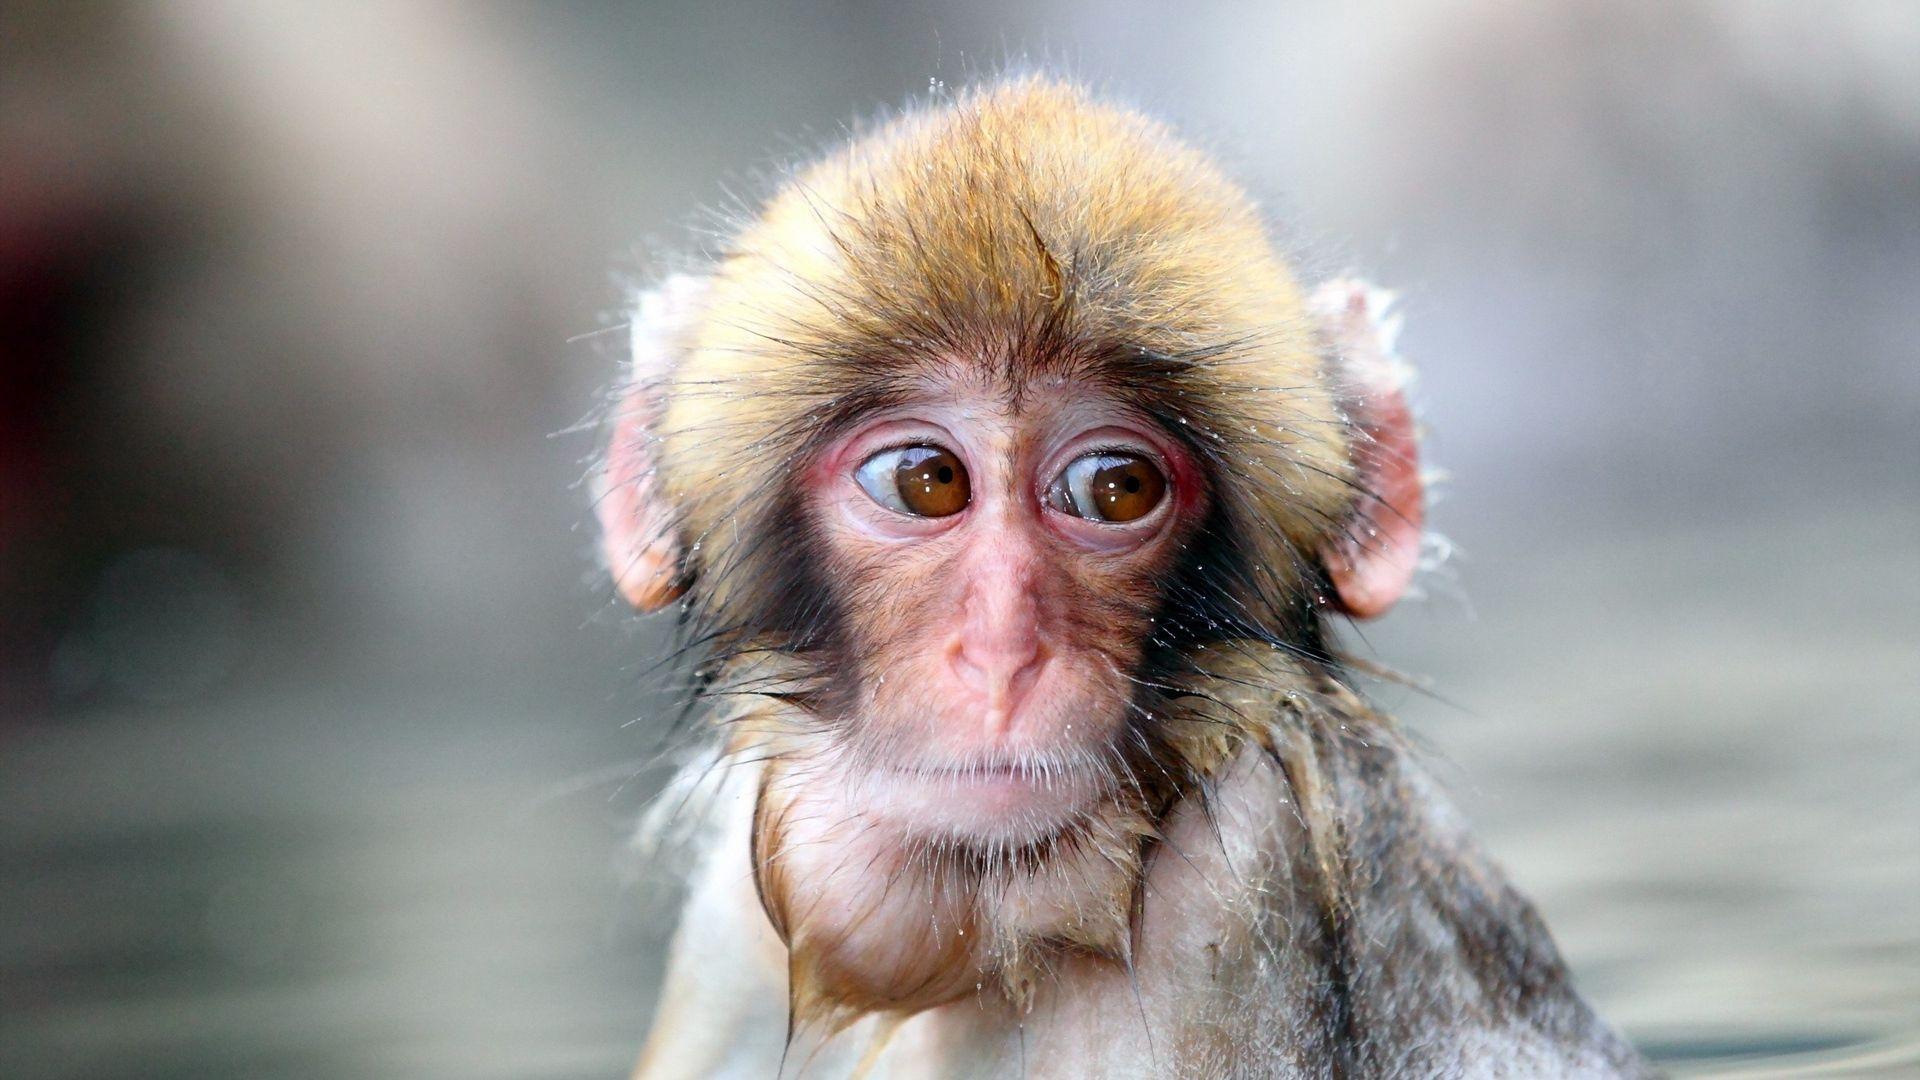 The Monkey Is Sad